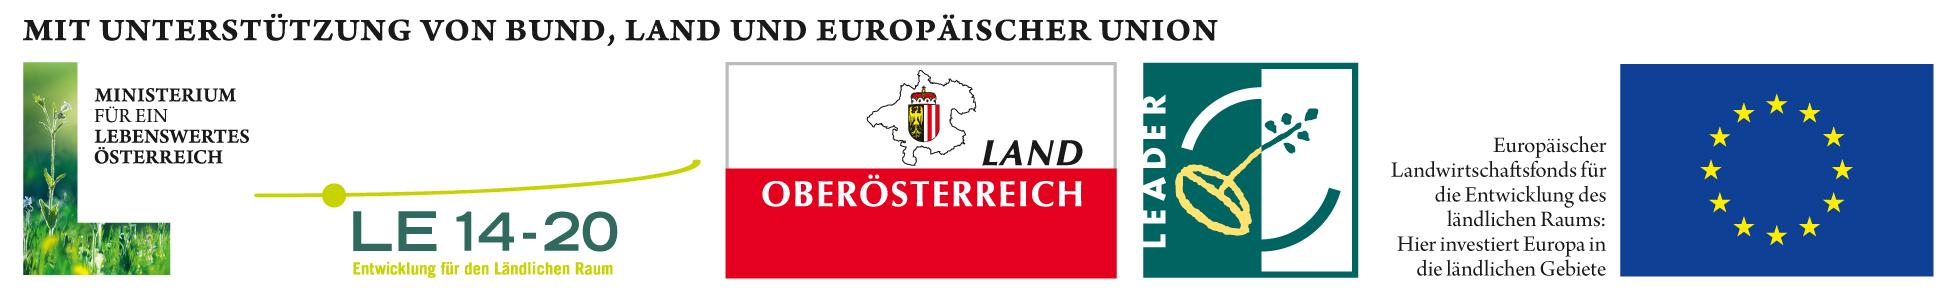 Logoleiste LFW Bund Land LEADER EU